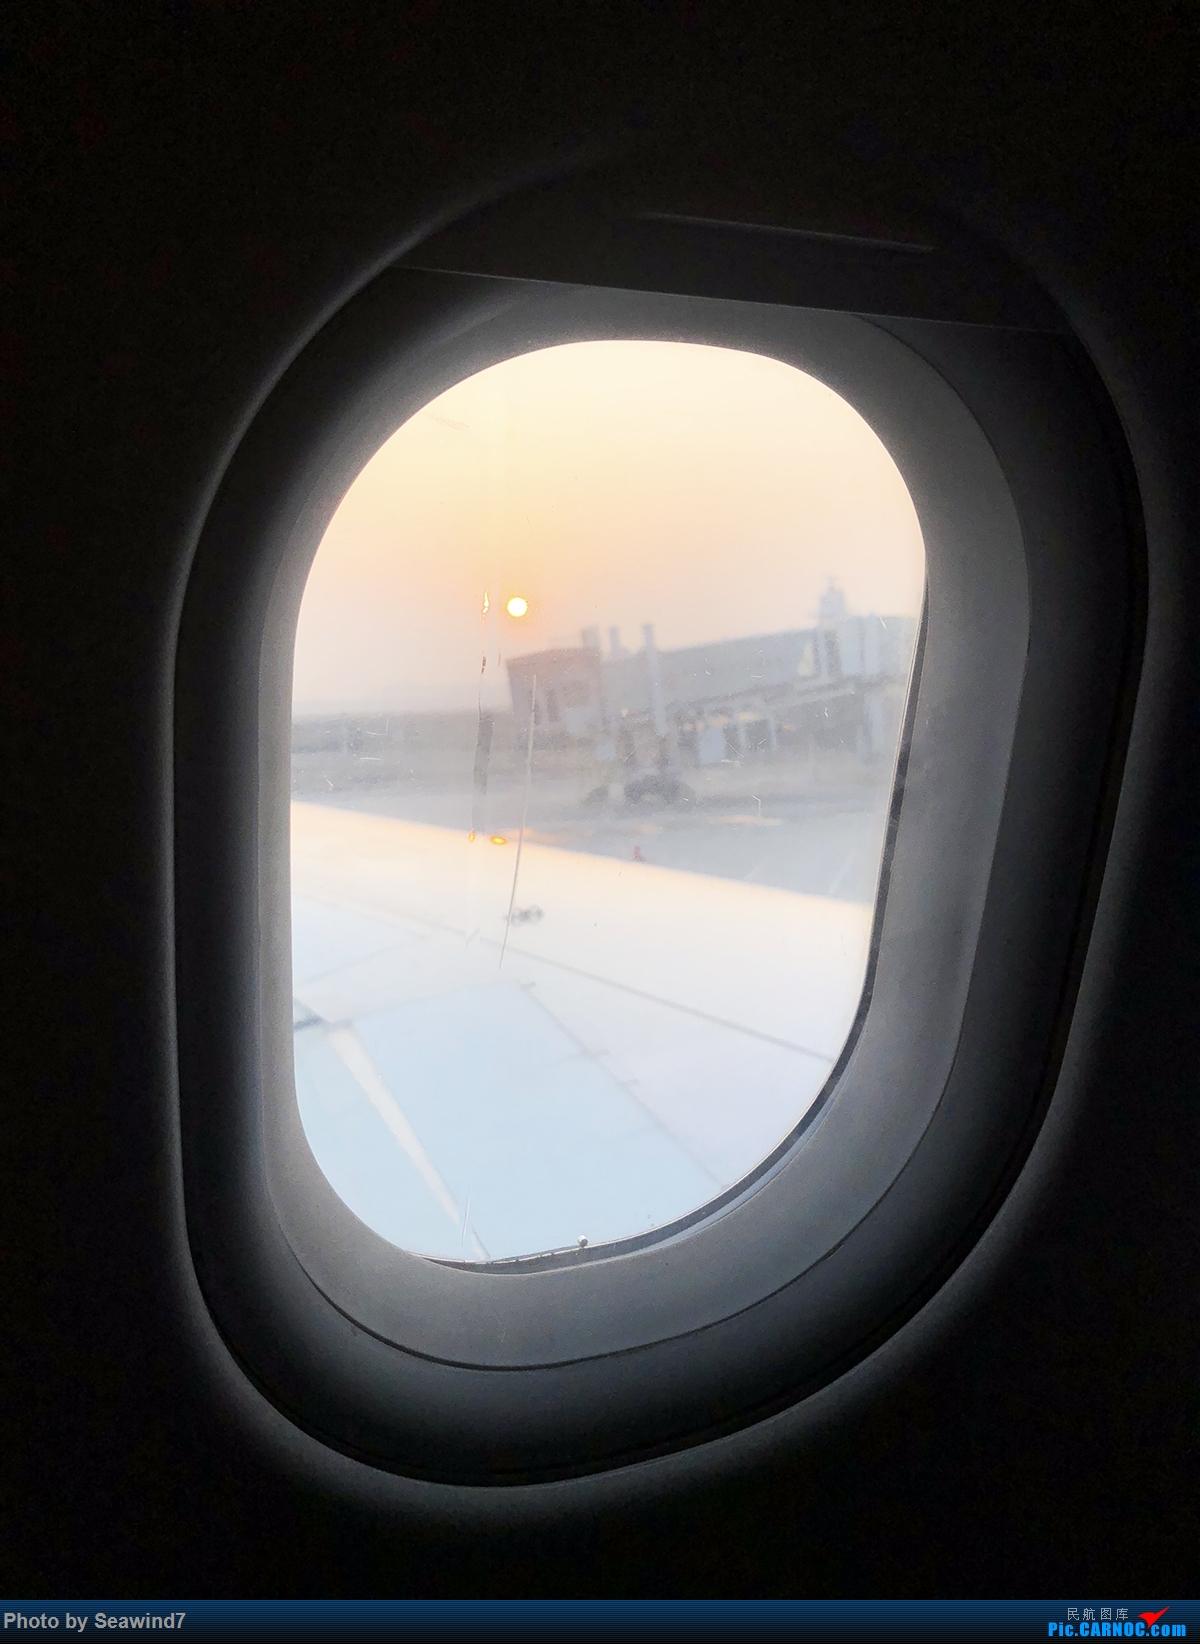 Re:[Seawind7游记第四弹]潮汕泉州小周转 AIRBUS A320-200 B-6002 中国合肥新桥国际机场